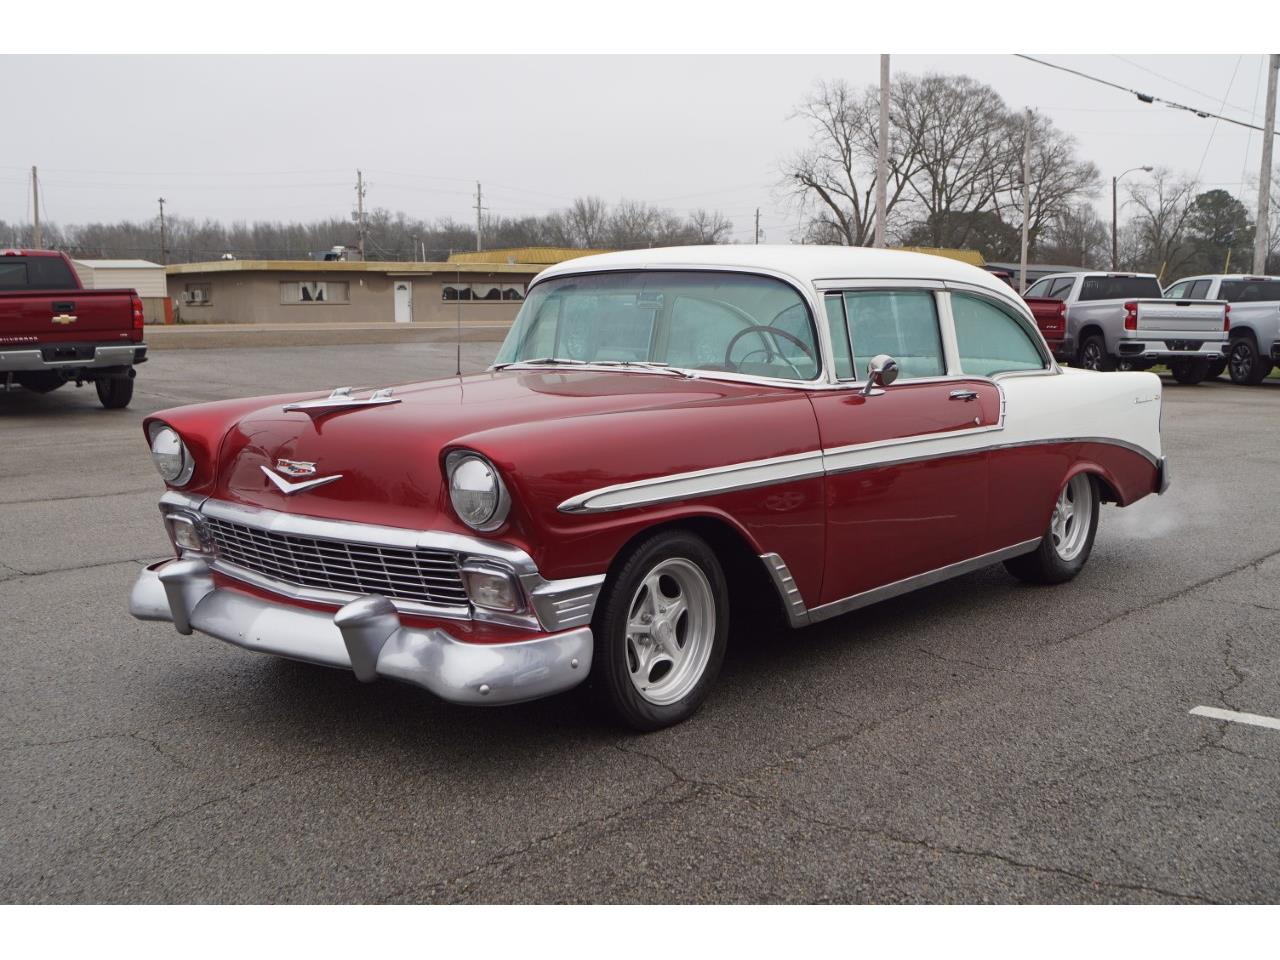 Chevrolet Bel Air >> 1956 Chevrolet Bel Air For Sale Classiccars Com Cc 1185692